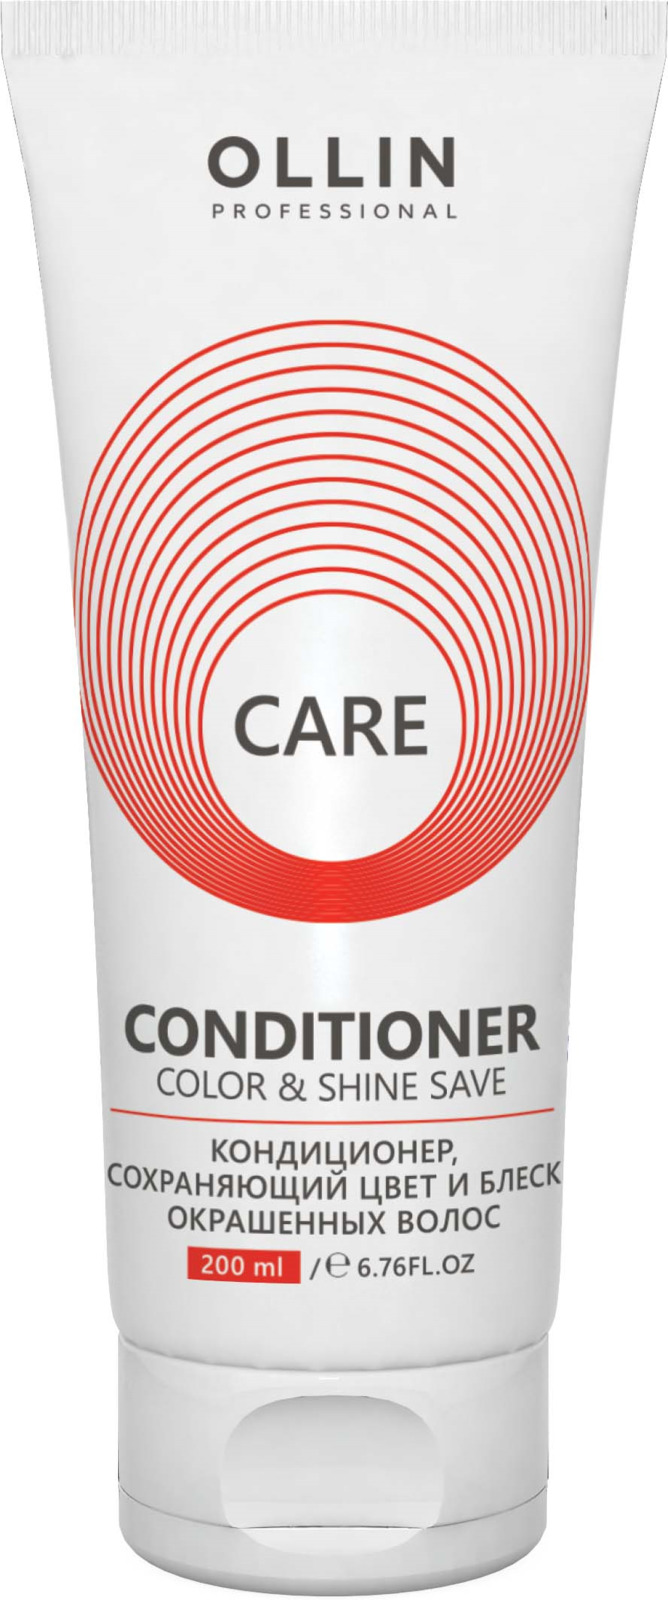 Ollin Кондиционер, сохраняющий цвет и блеск окрашенных волос Care Color and Shine Save Conditioner 200 мл ollin бальзам для окрашенных волос стабилизатор цвета ollin care color and shine save conditioner for colored hair 729841 1000 мл